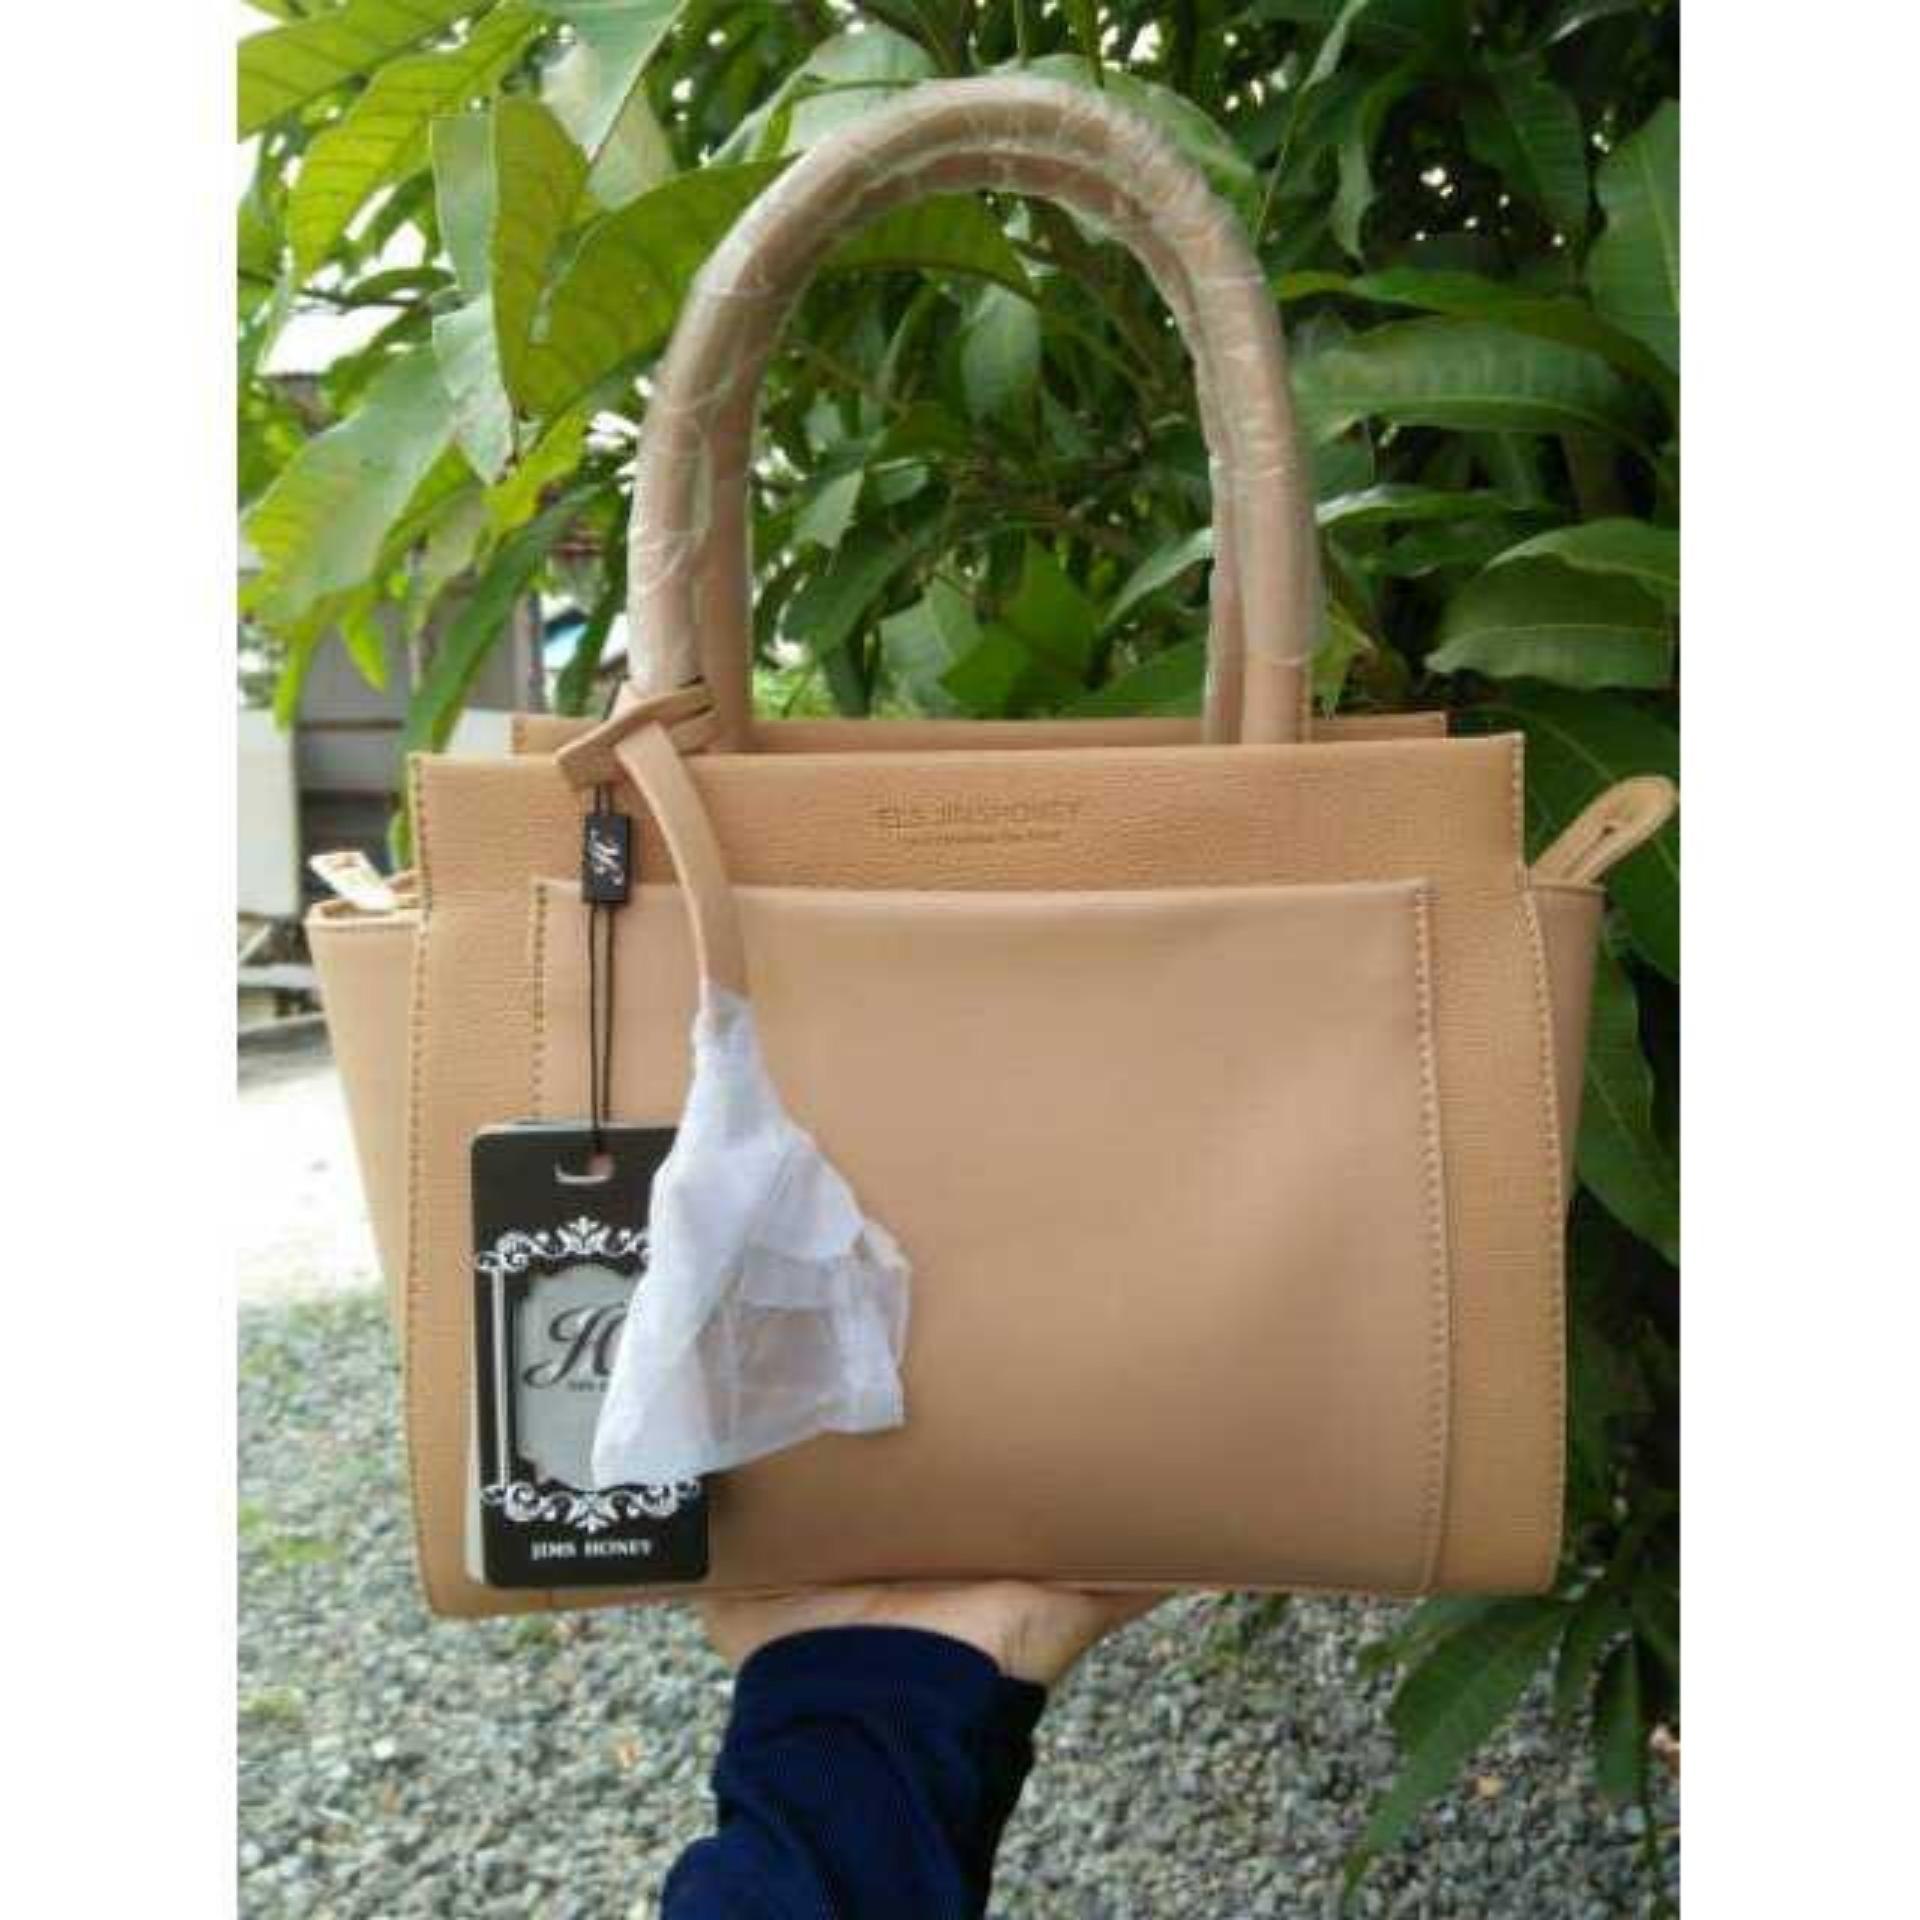 JH Celine Bag - Tas Import Jim's'honey ORGINAL [BROWN]